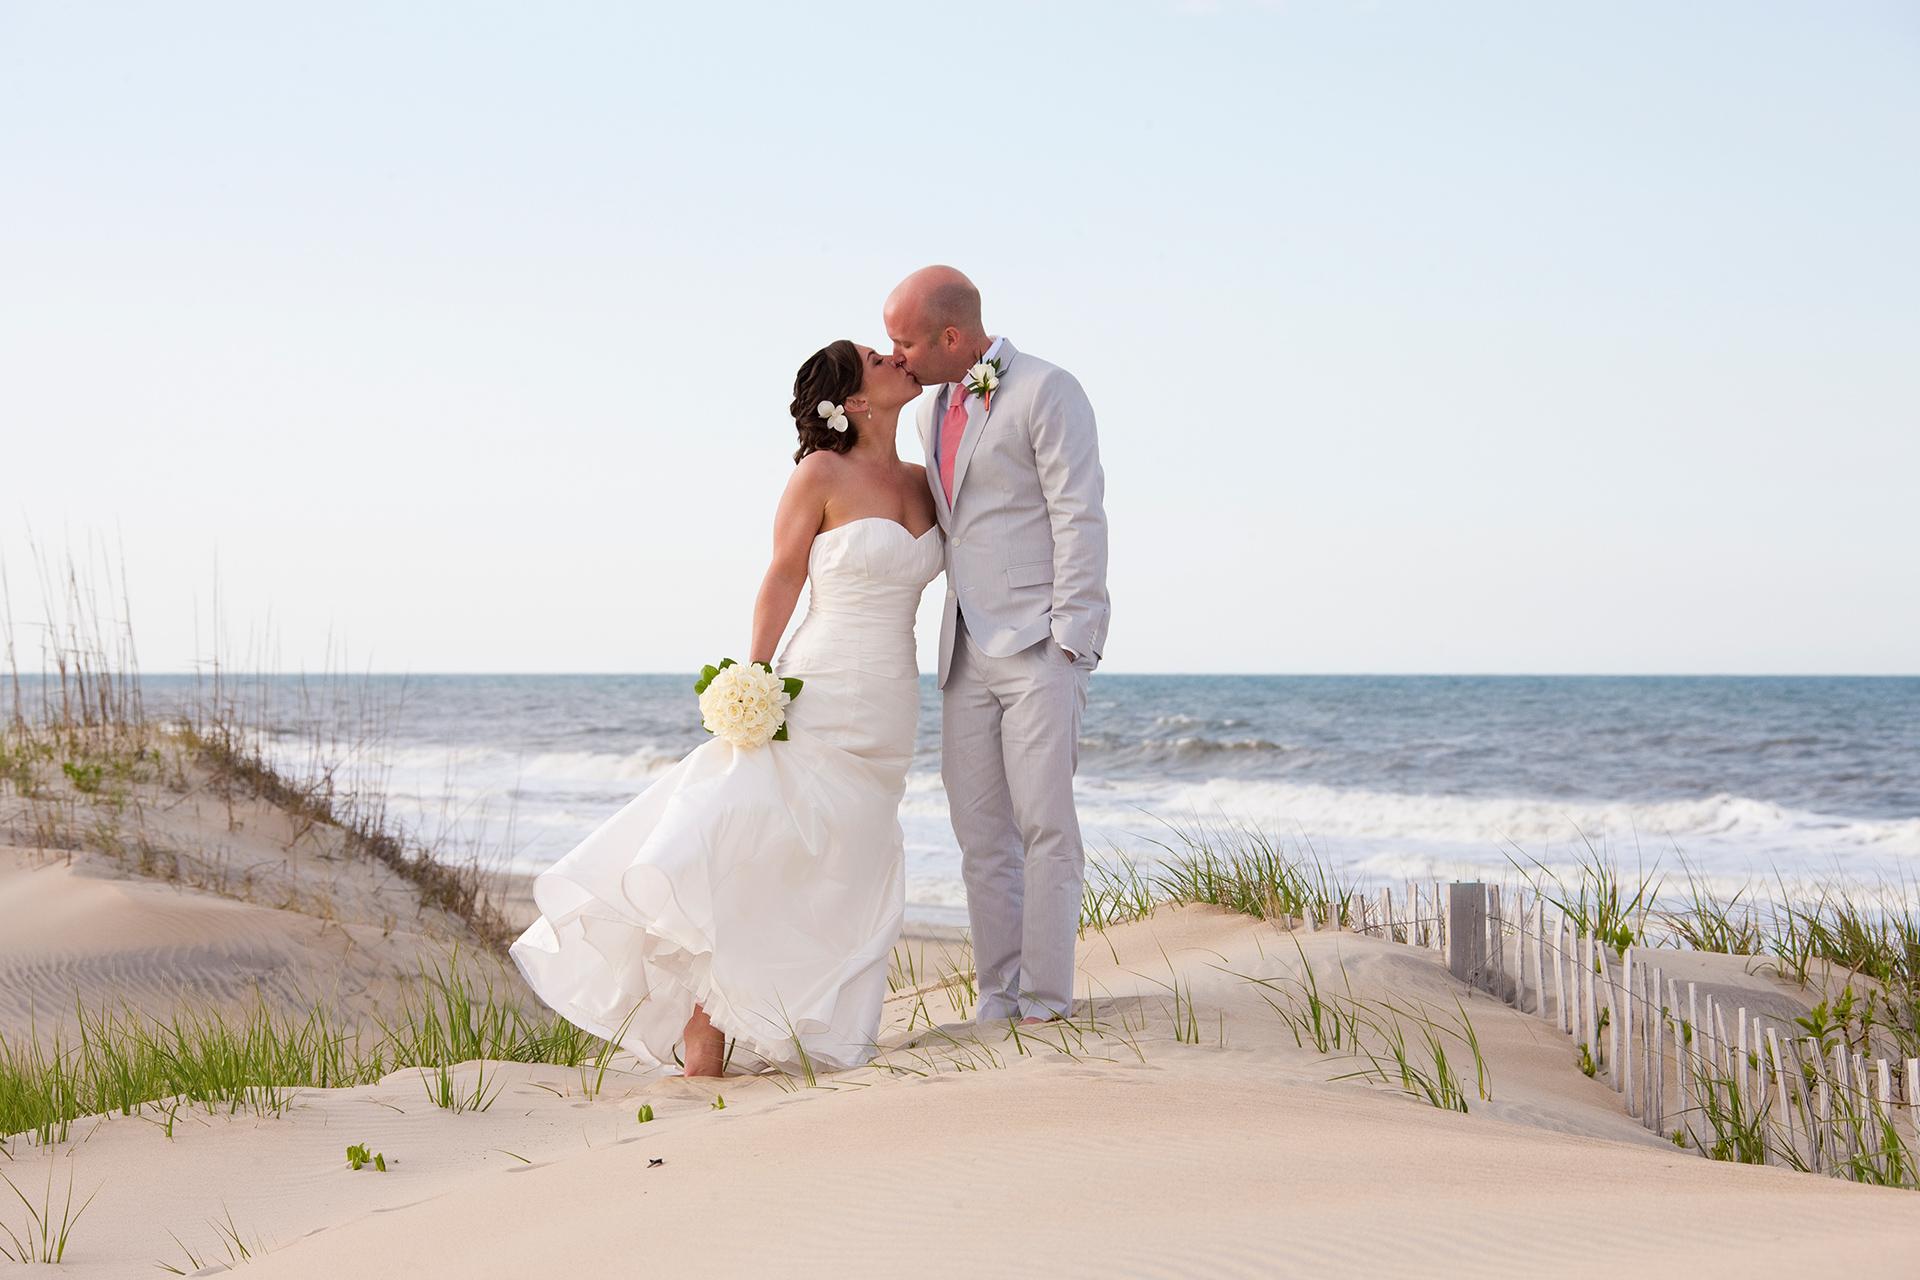 Outer Banks Wedding PhotographyBeach Portraits